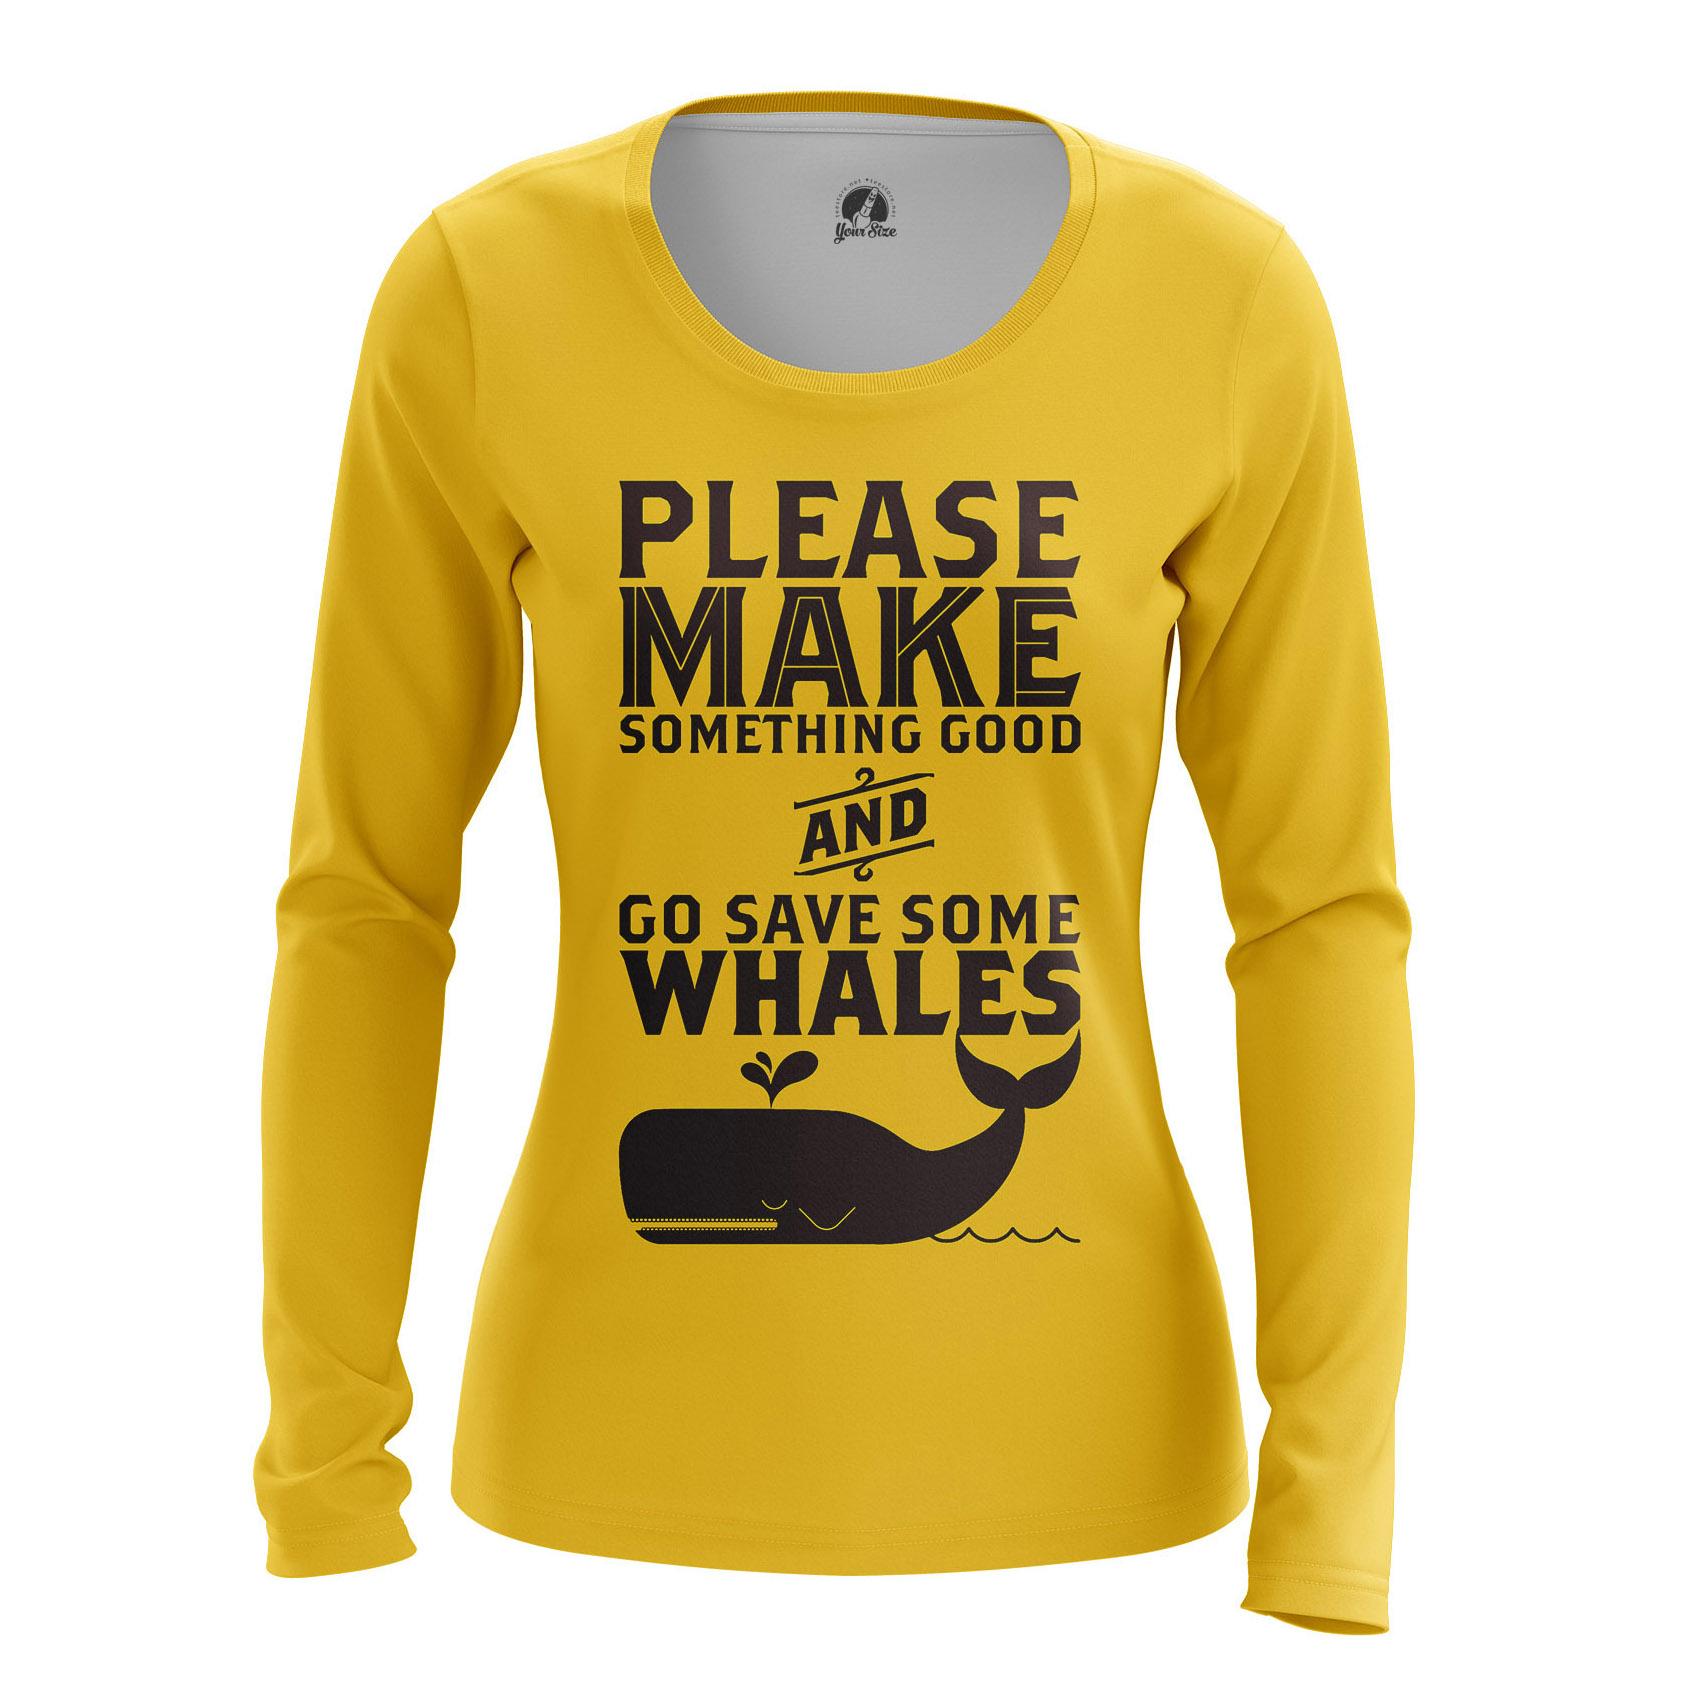 W-Lon-Savesomewhales_1482275416_529